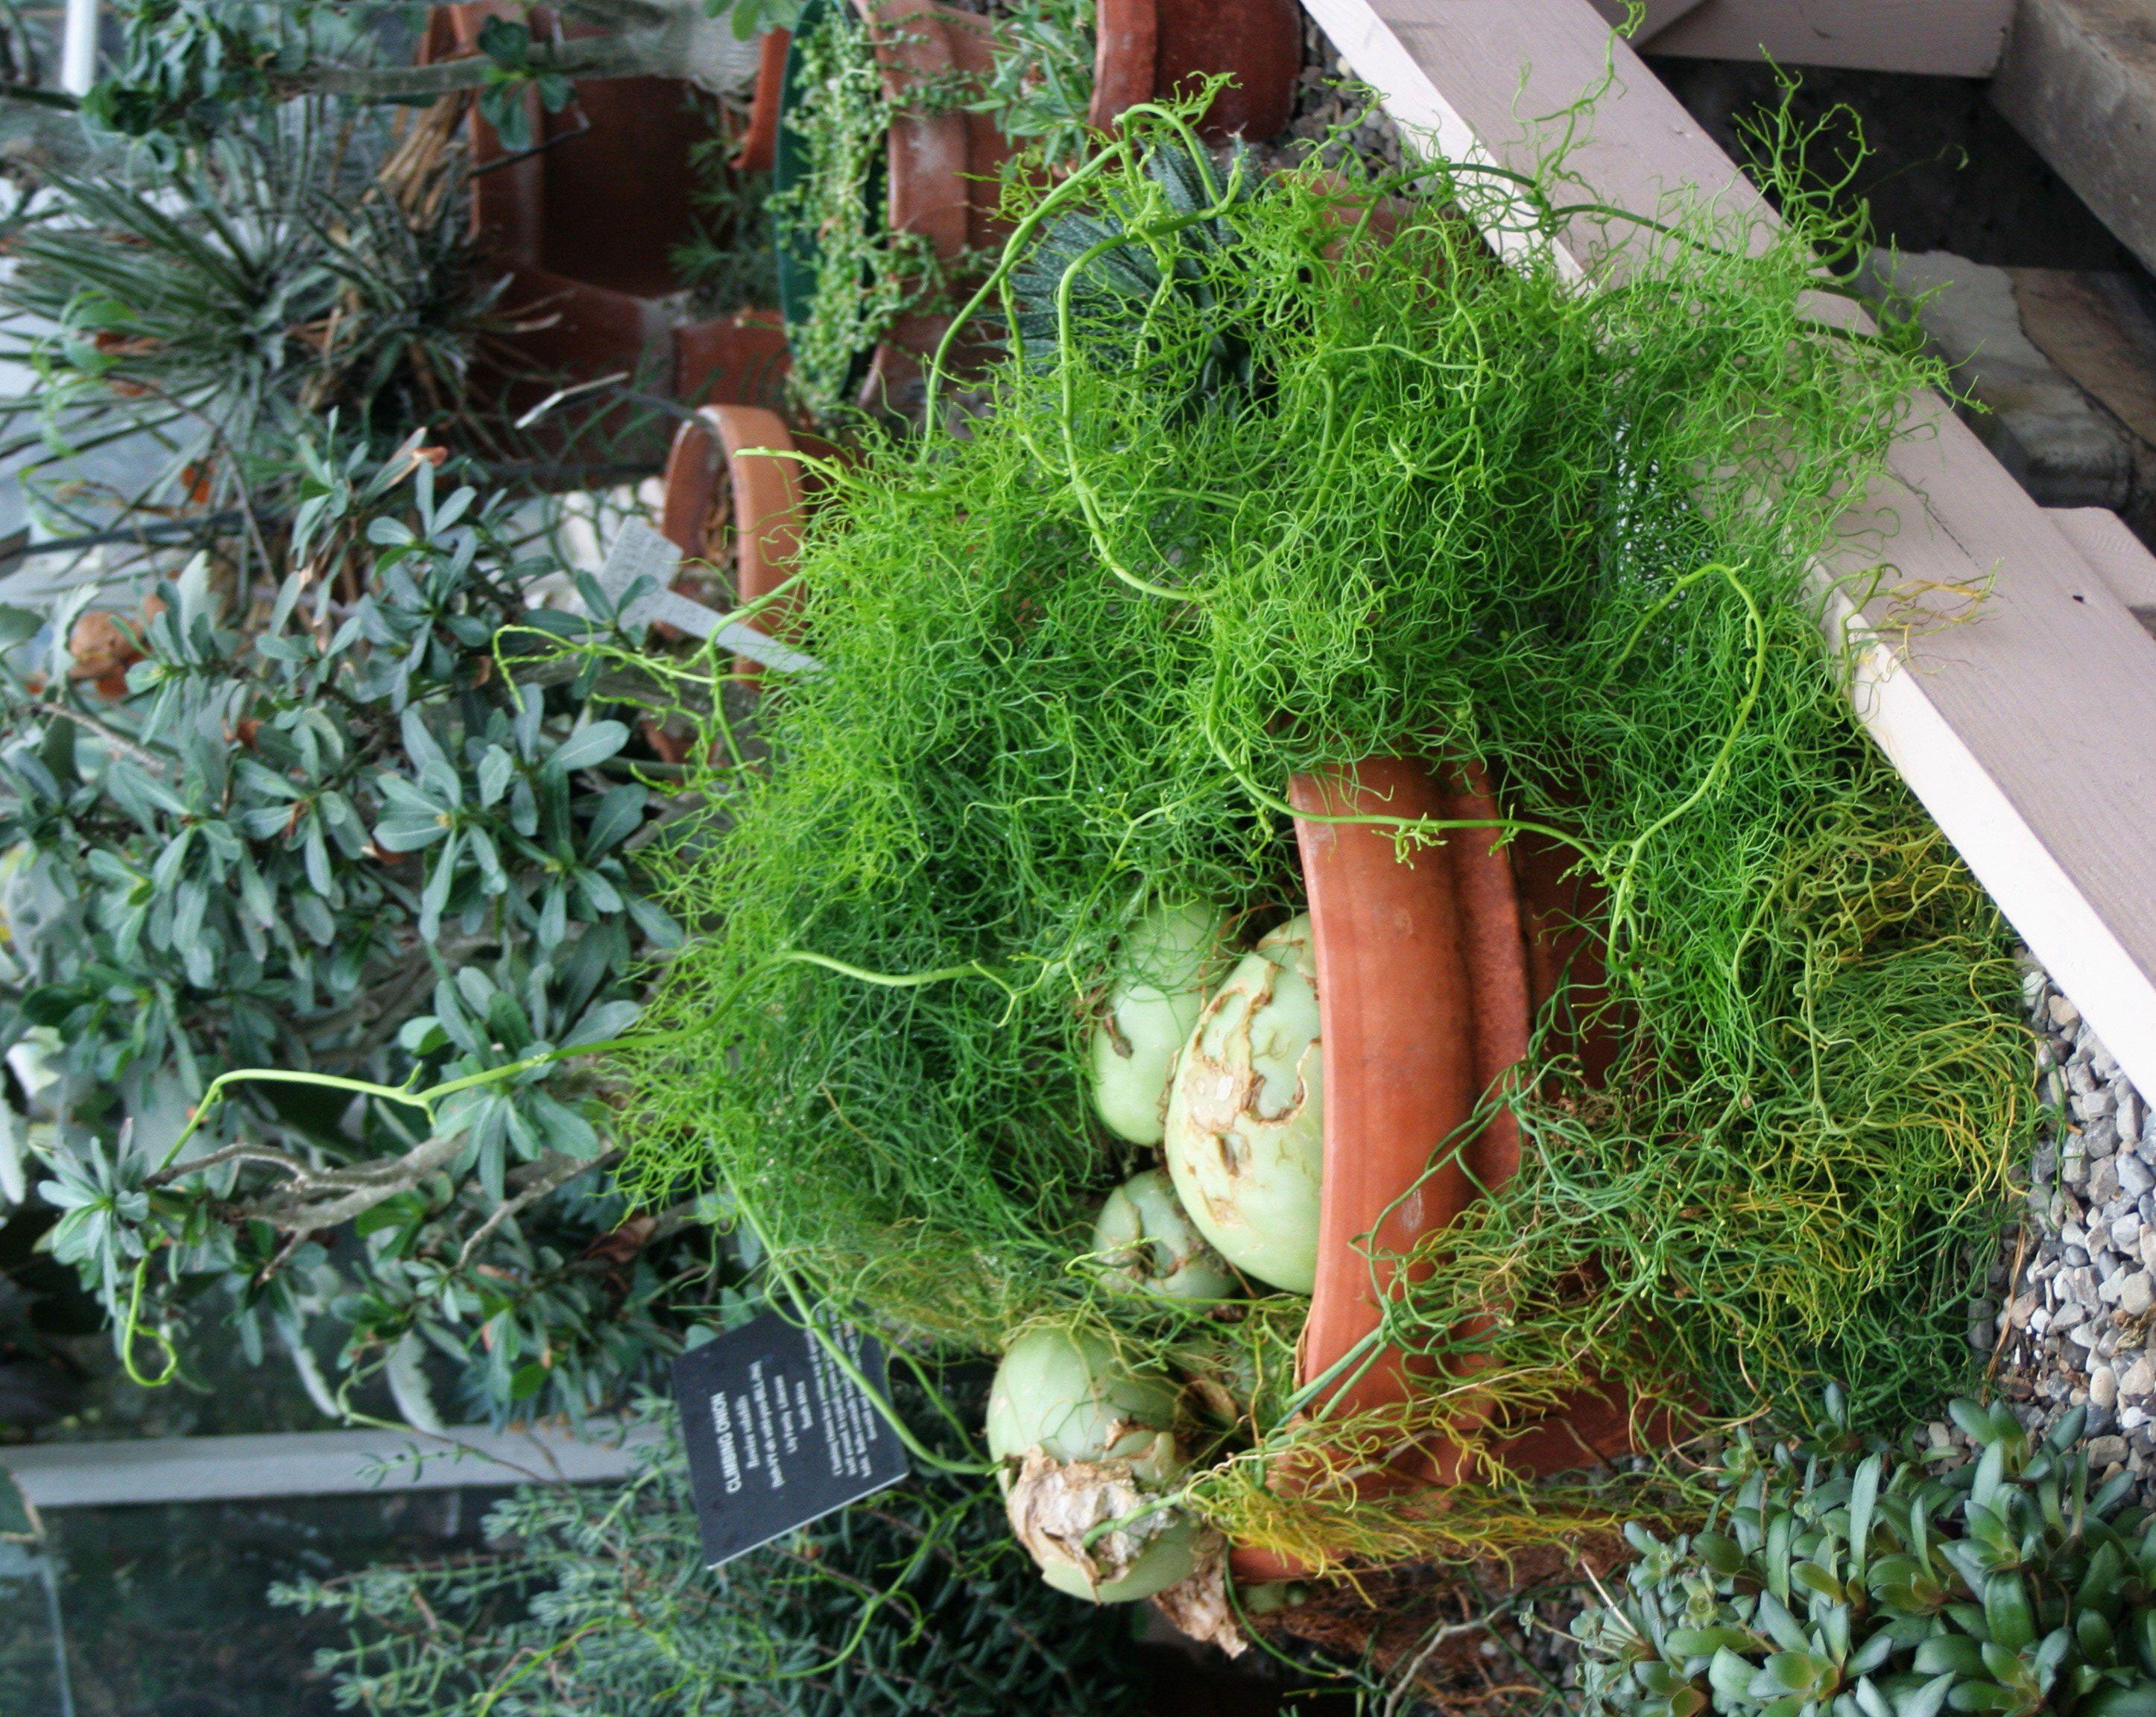 ravishing house plants care. About Climbing Sea Onions  How To Grow A Onion Plant